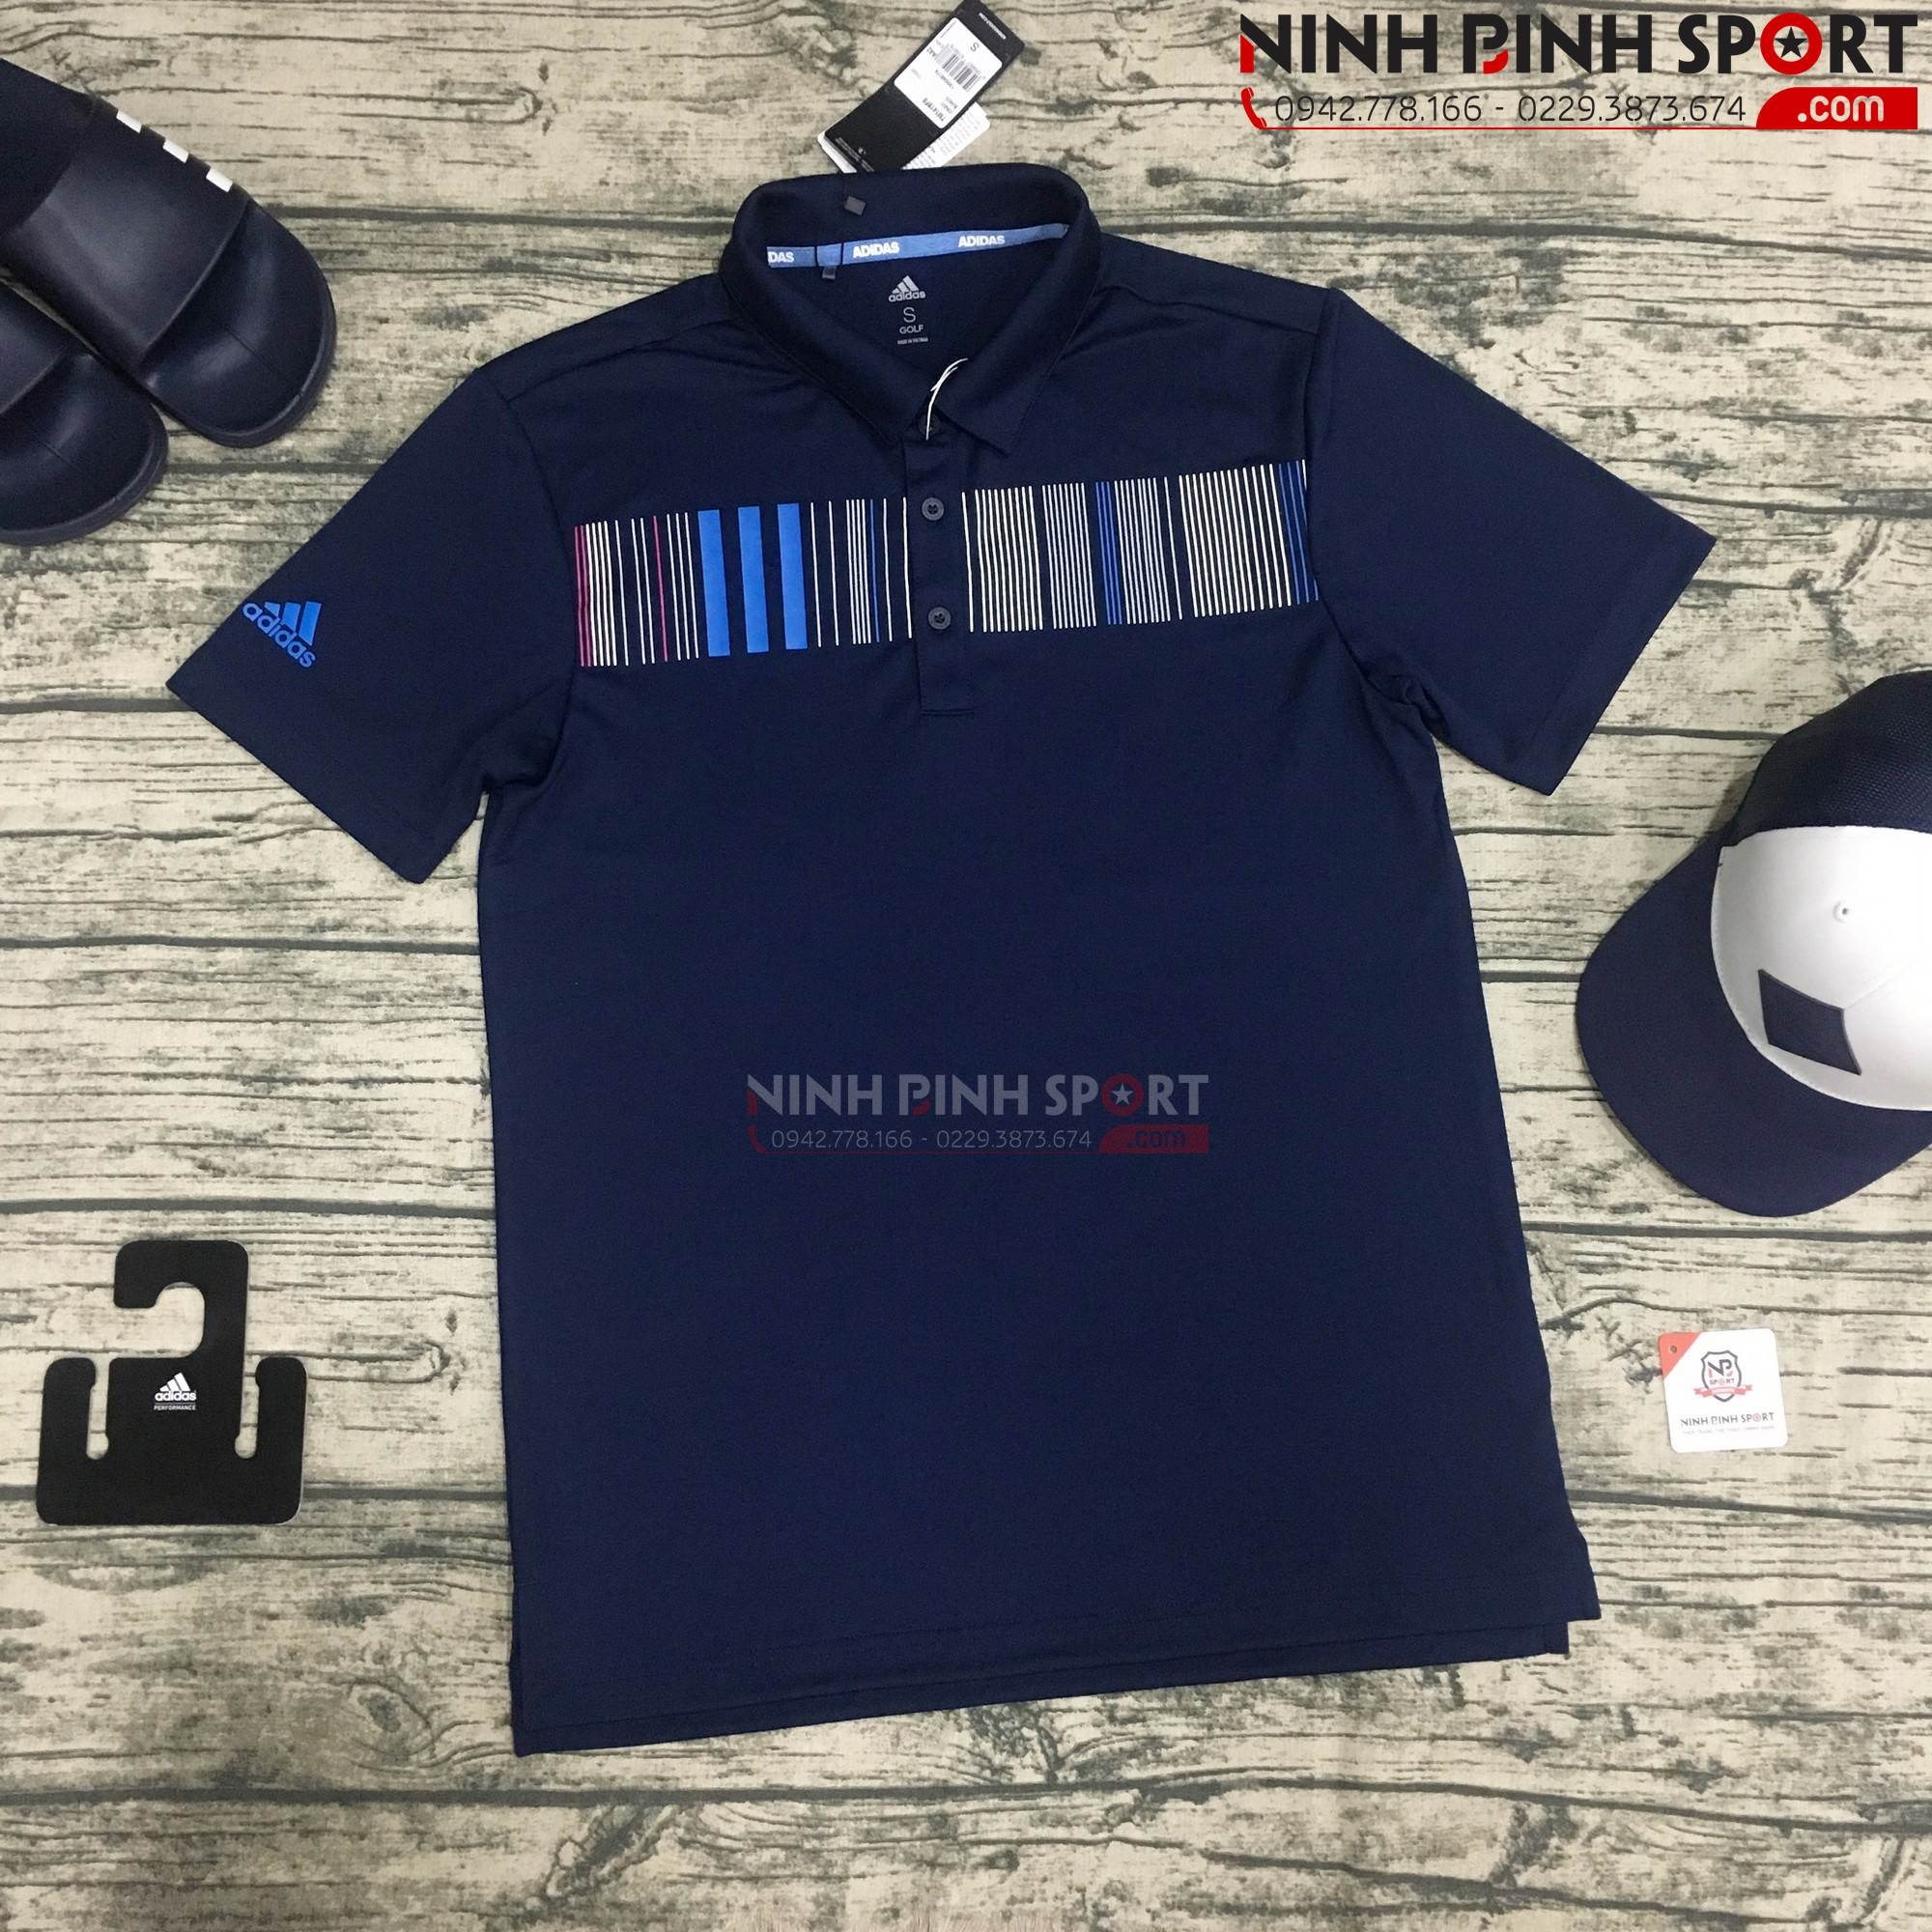 Áo thể thao nam Adidas Vertical Stripe Blue  CY9357